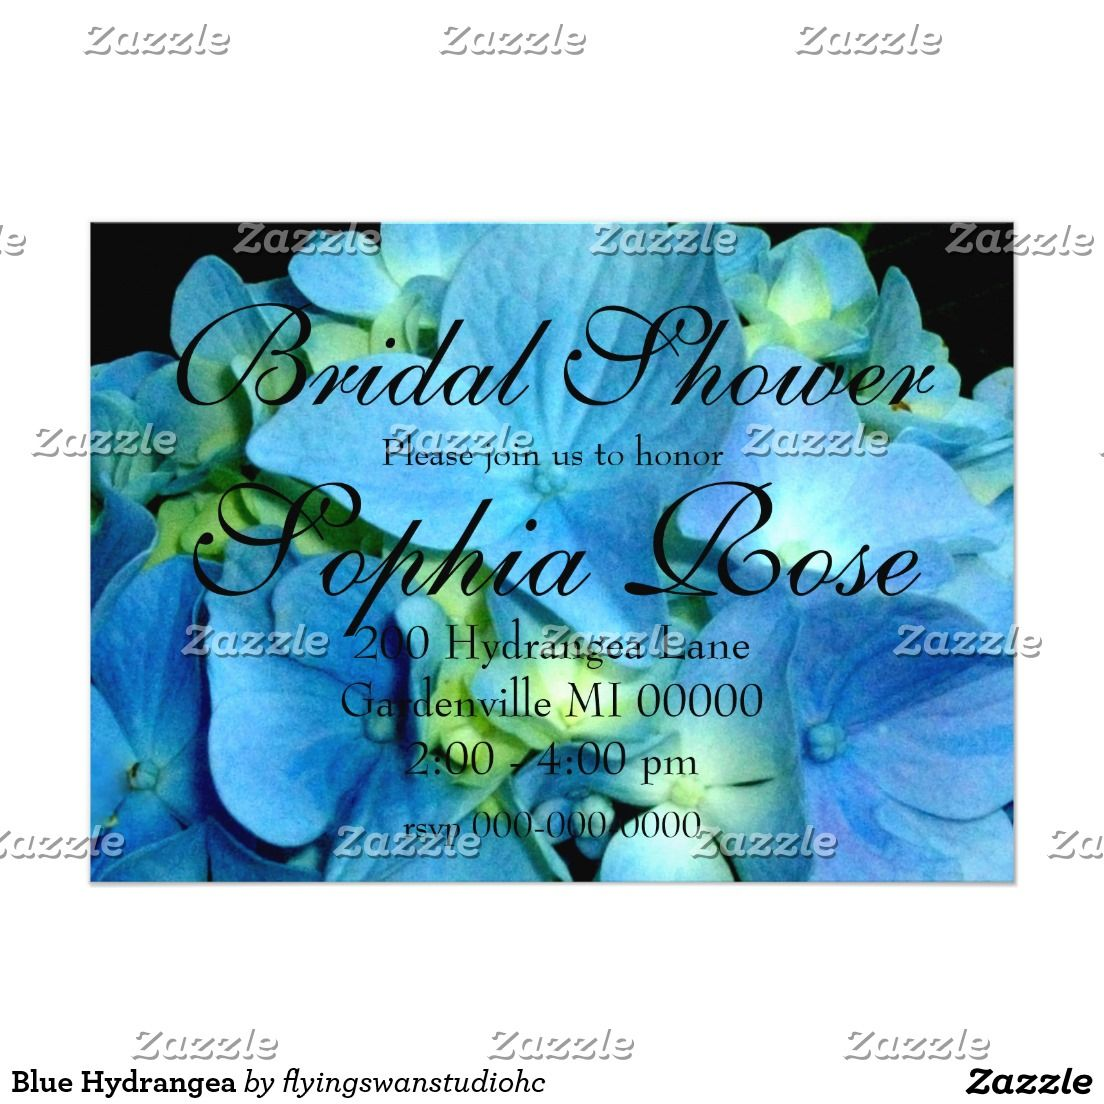 Blue Hydrangea Card Bridal shower invitation - customize at Zazzle.com